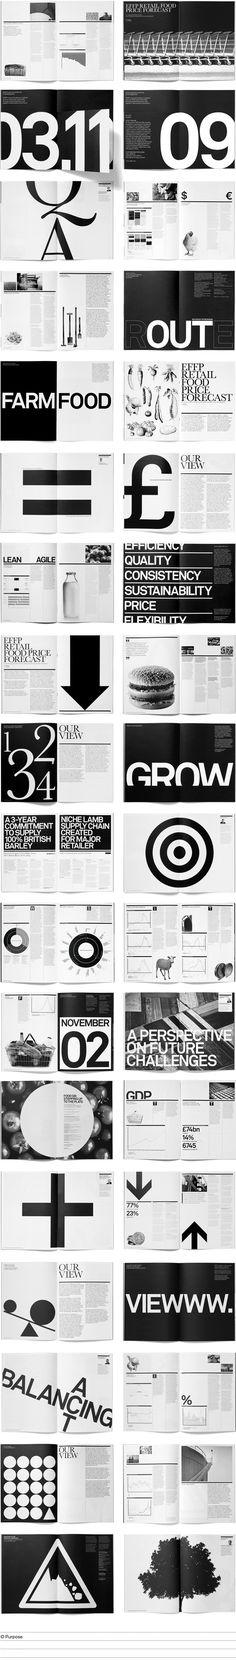 Outstanding work! - EFFP View Magazine | Designer: Paul Felton Design: